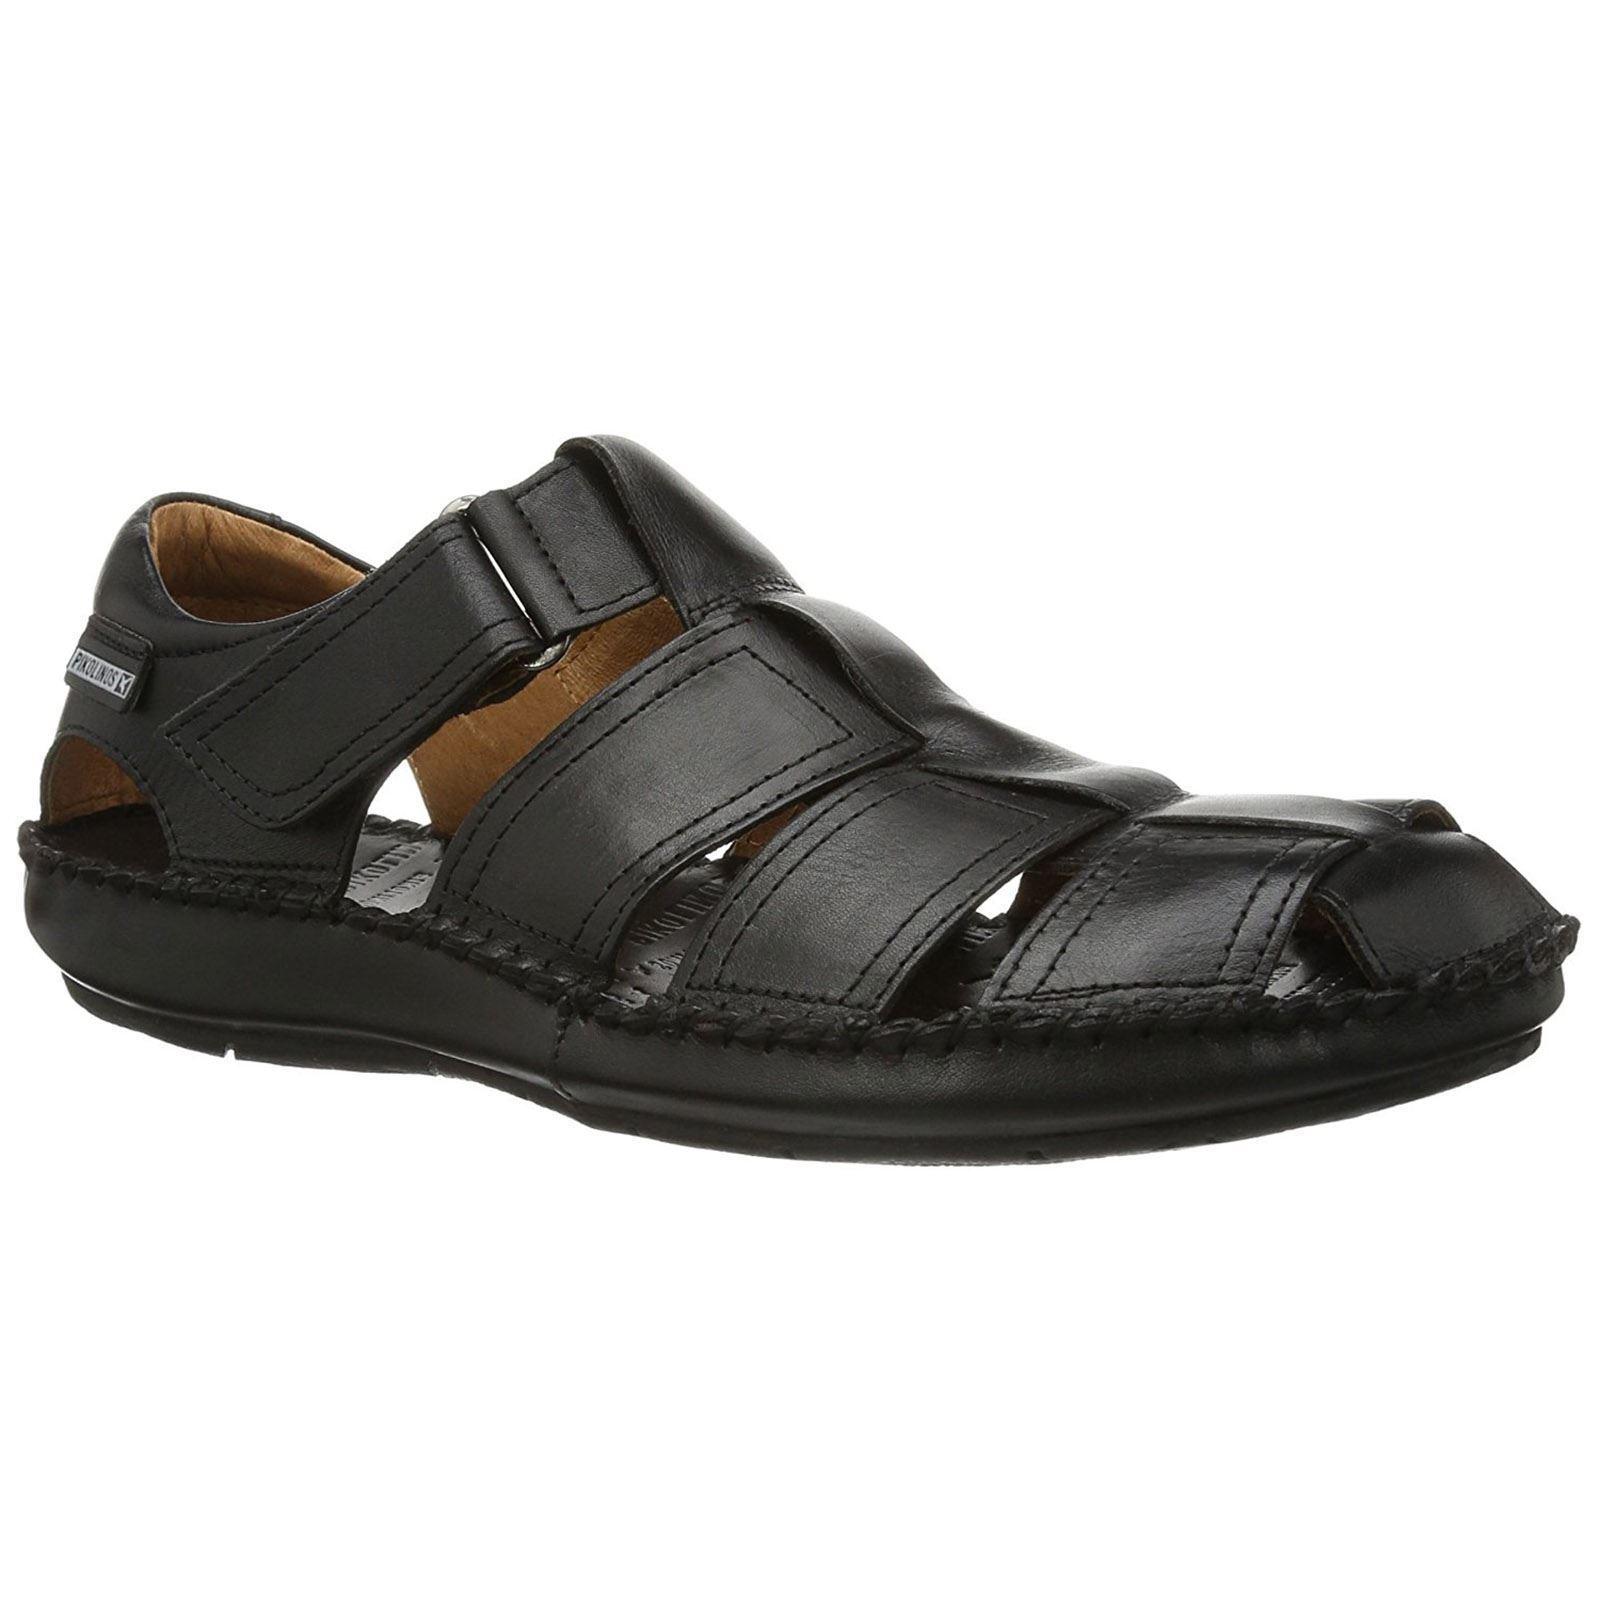 Pikolinos Tarifa 06J-5433 Black Mens Leather Fisherman Strappy Sandals